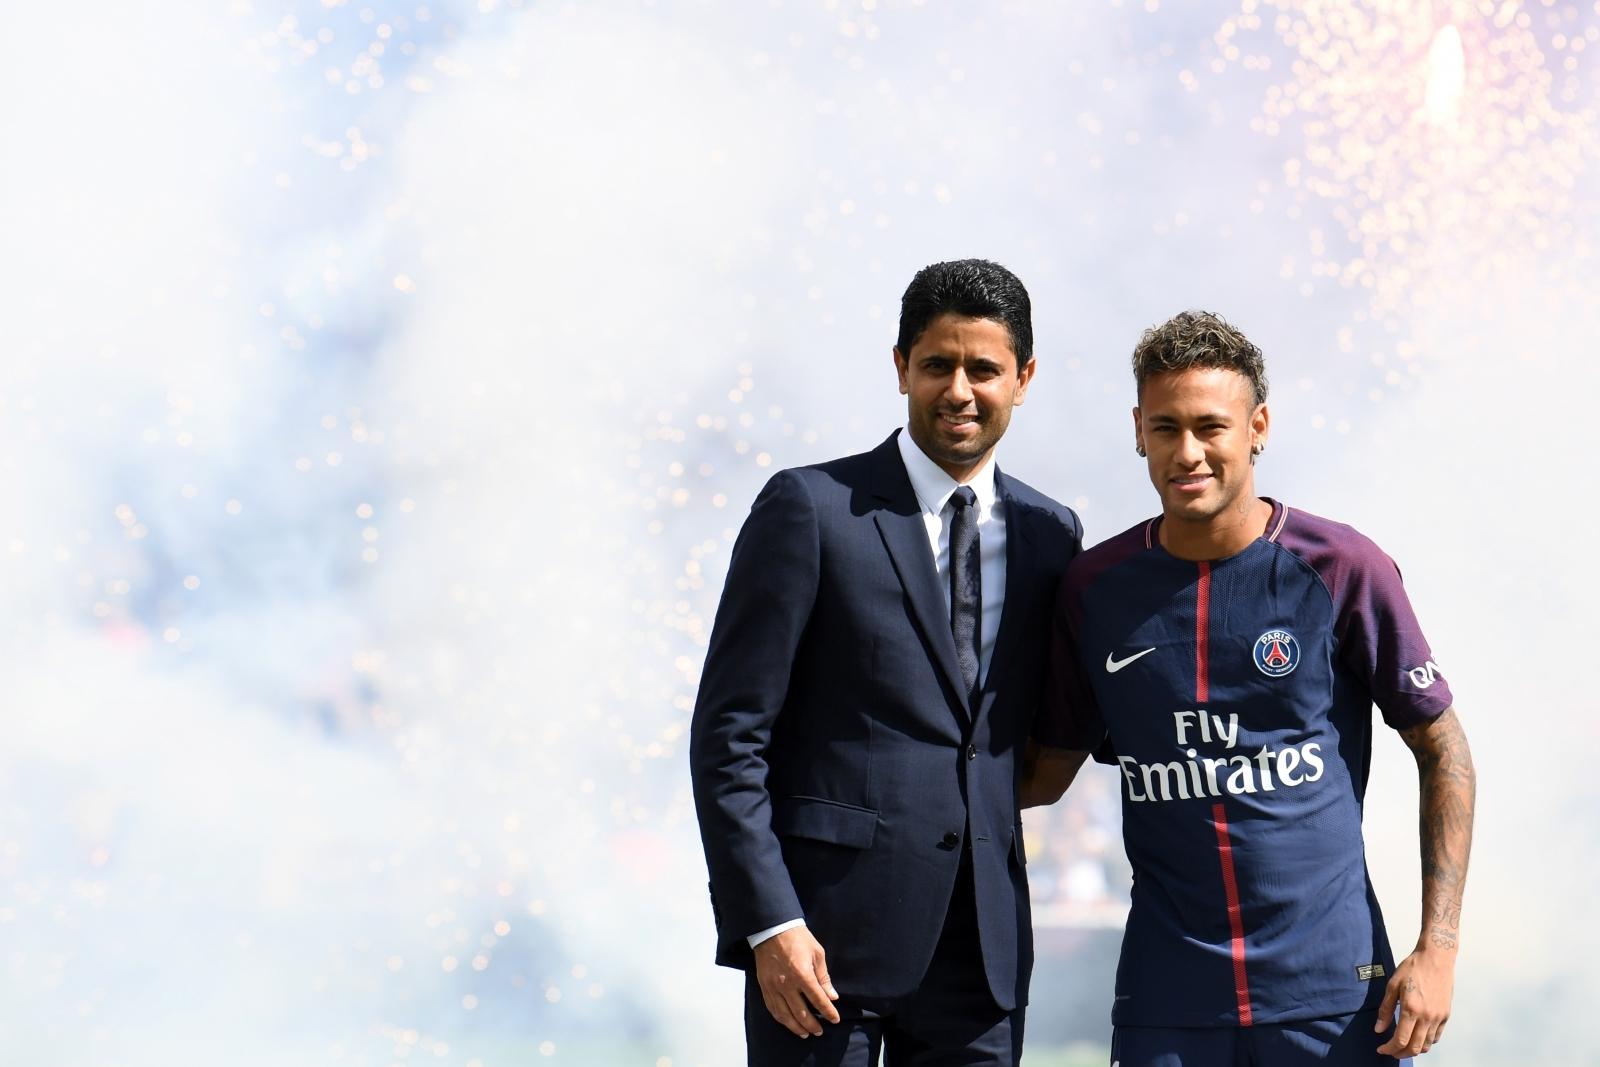 Nasser Al-Khelaifi and Neymar